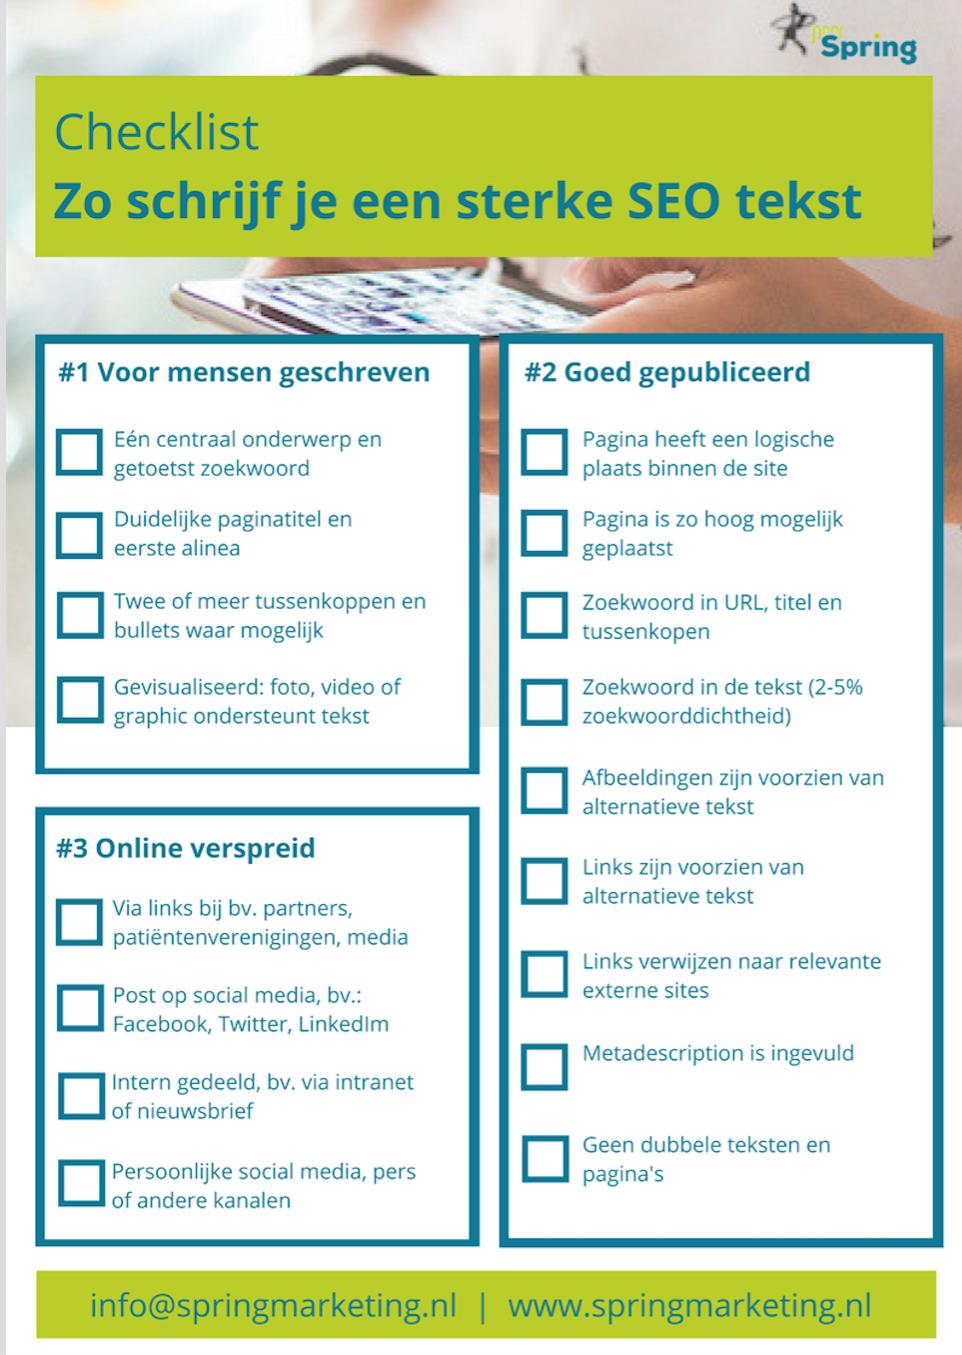 Checklist SEO tekst